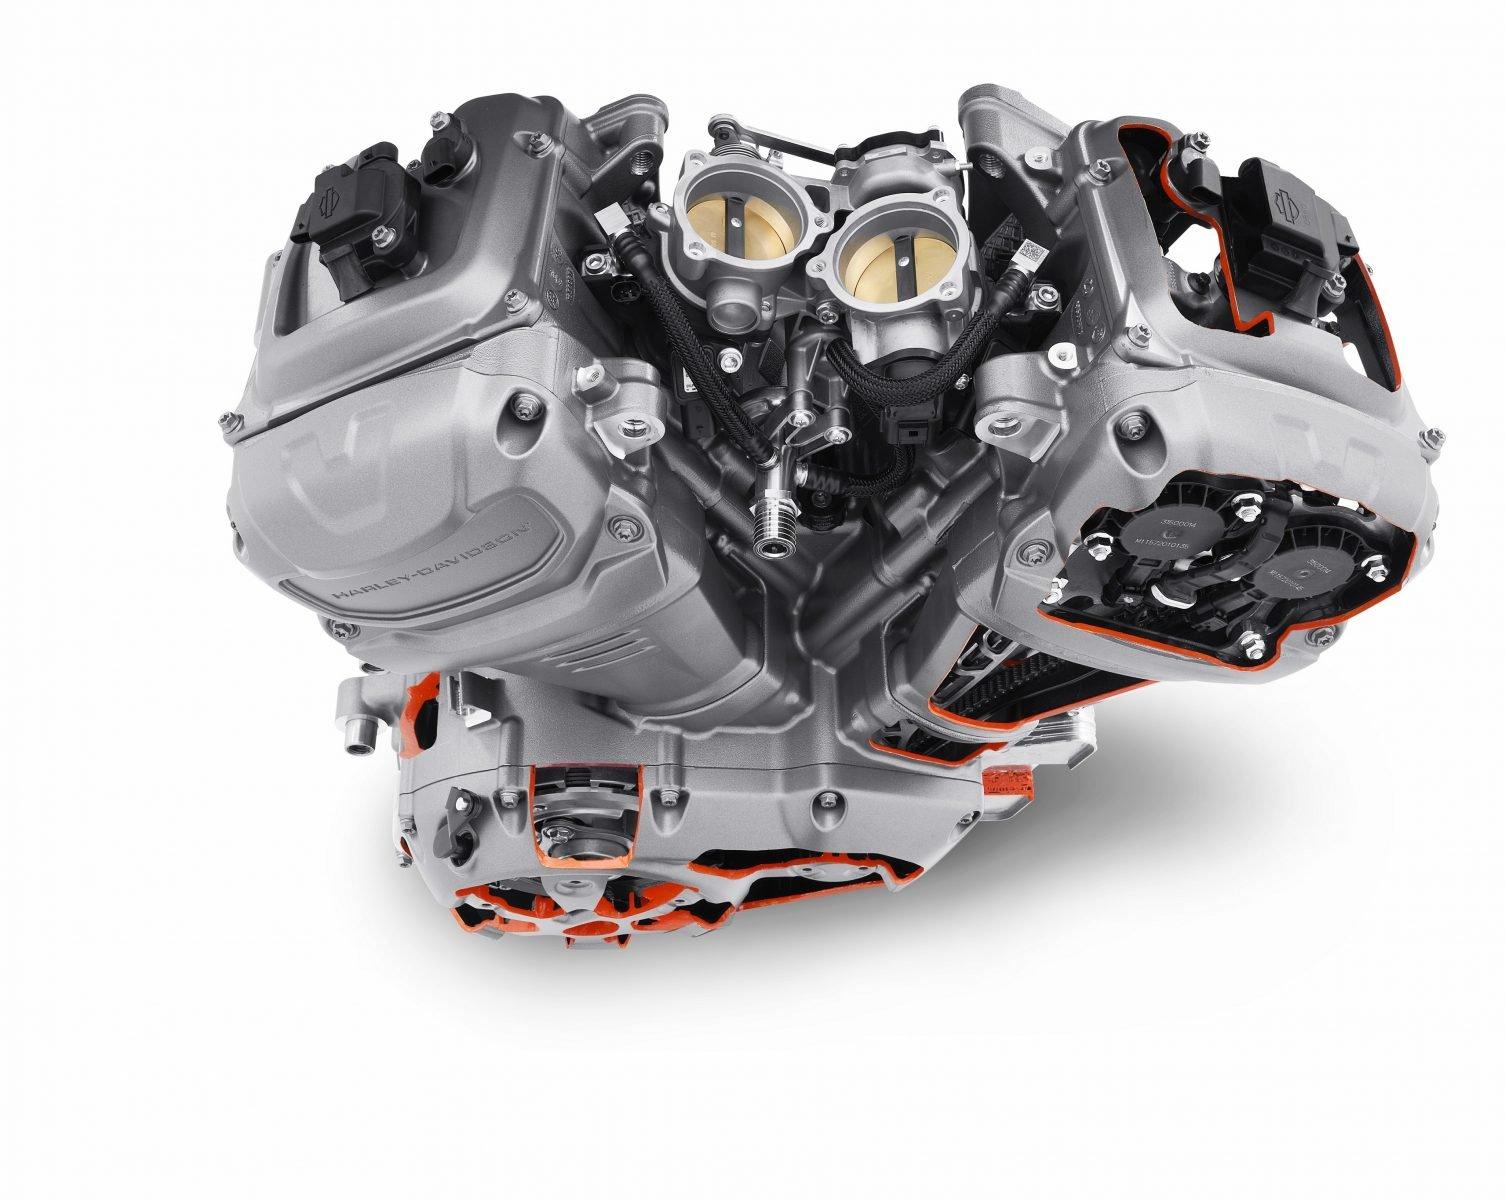 harley davidson pan america 1250 motor revolution max 29